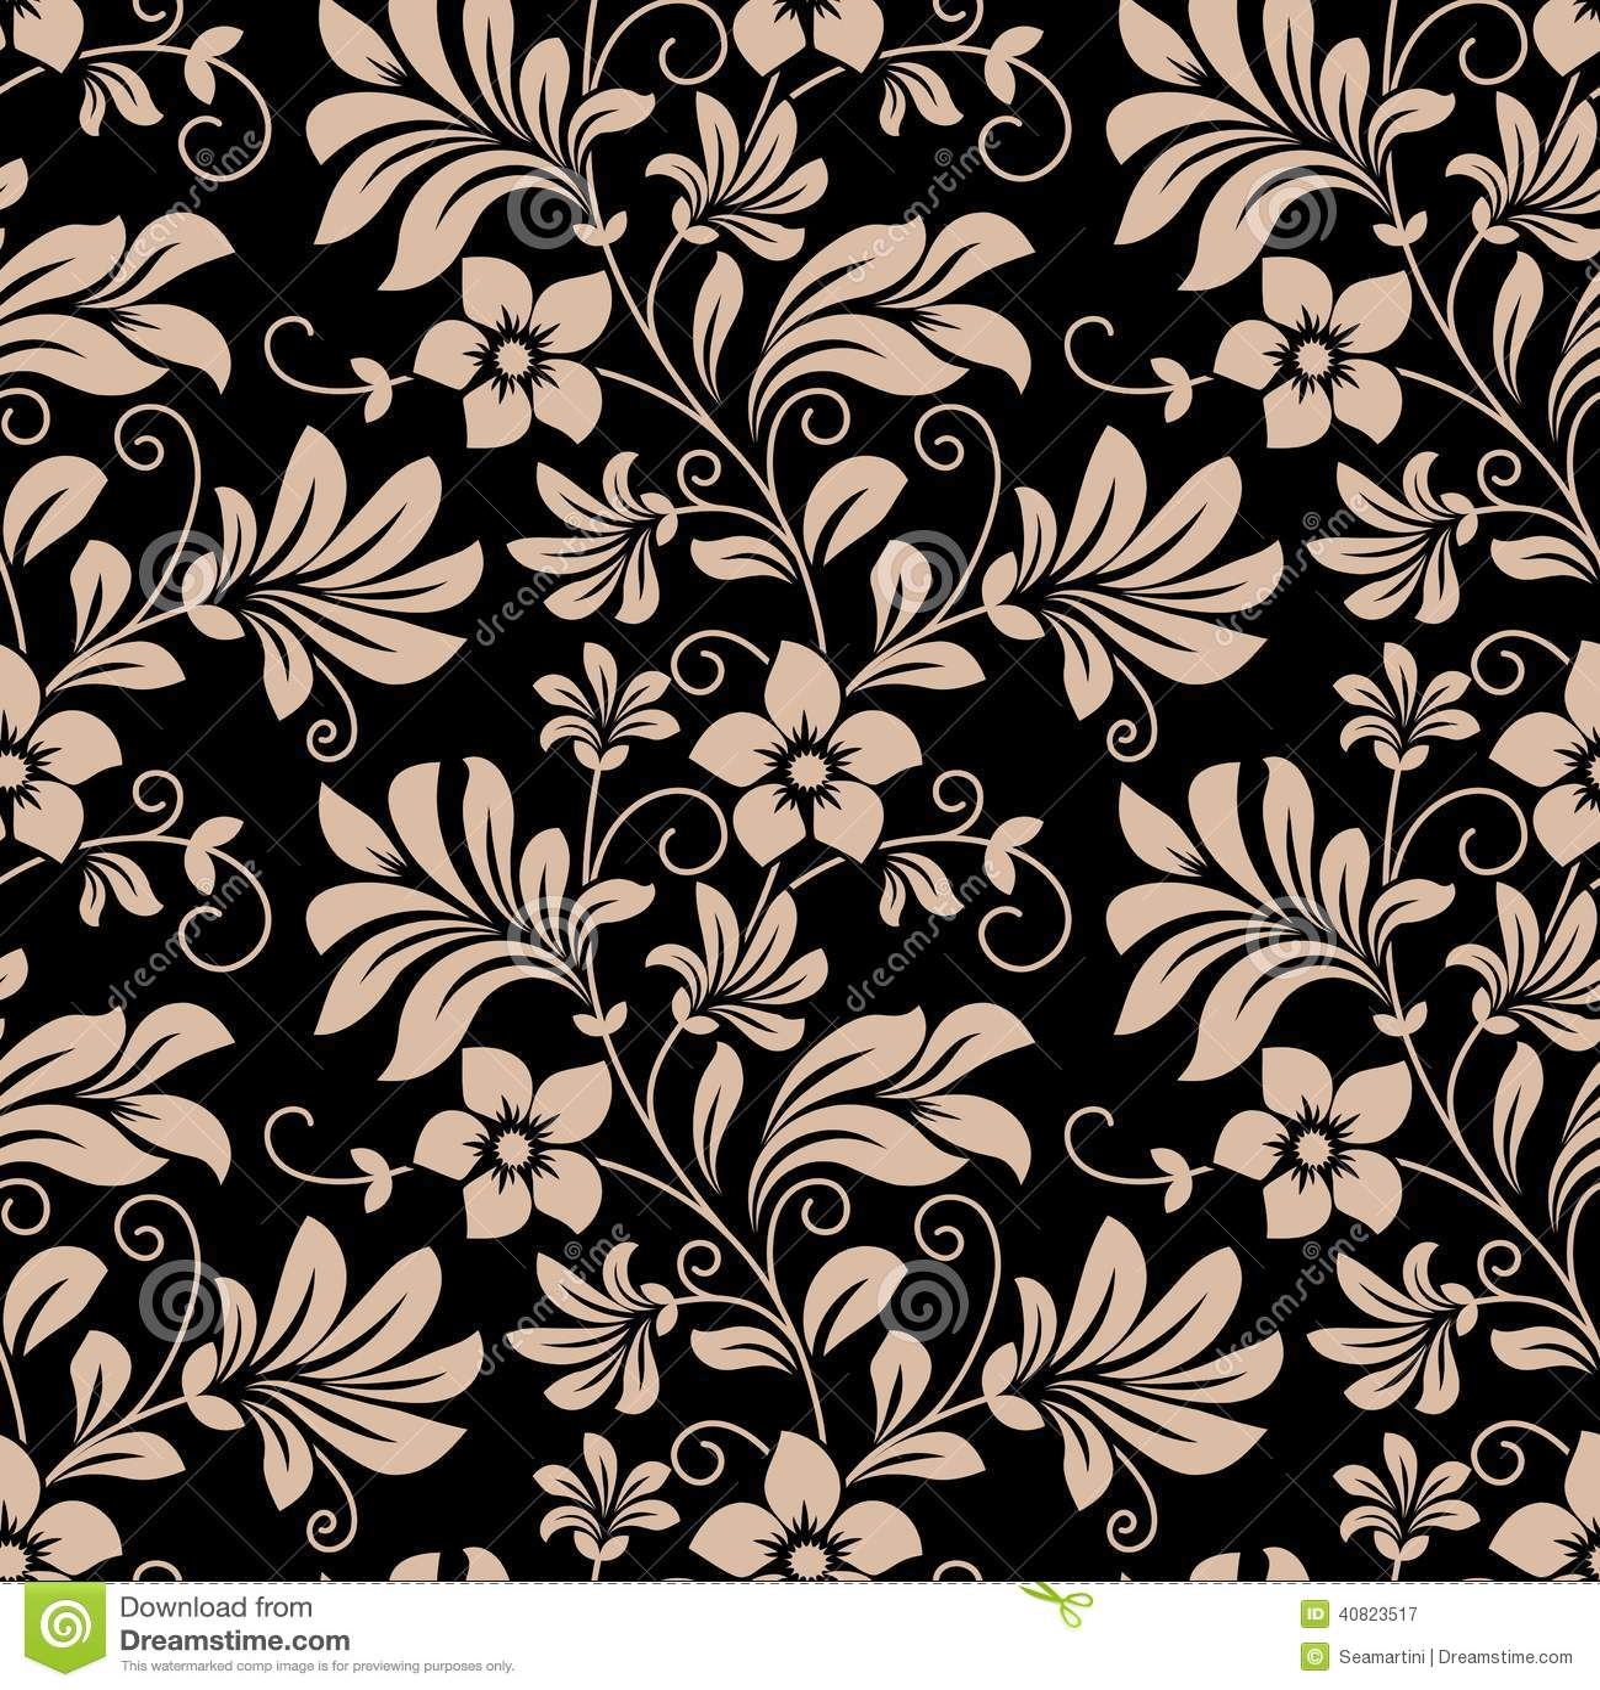 Vintage Floral Wallpaper Seamless Pattern Stock Vector